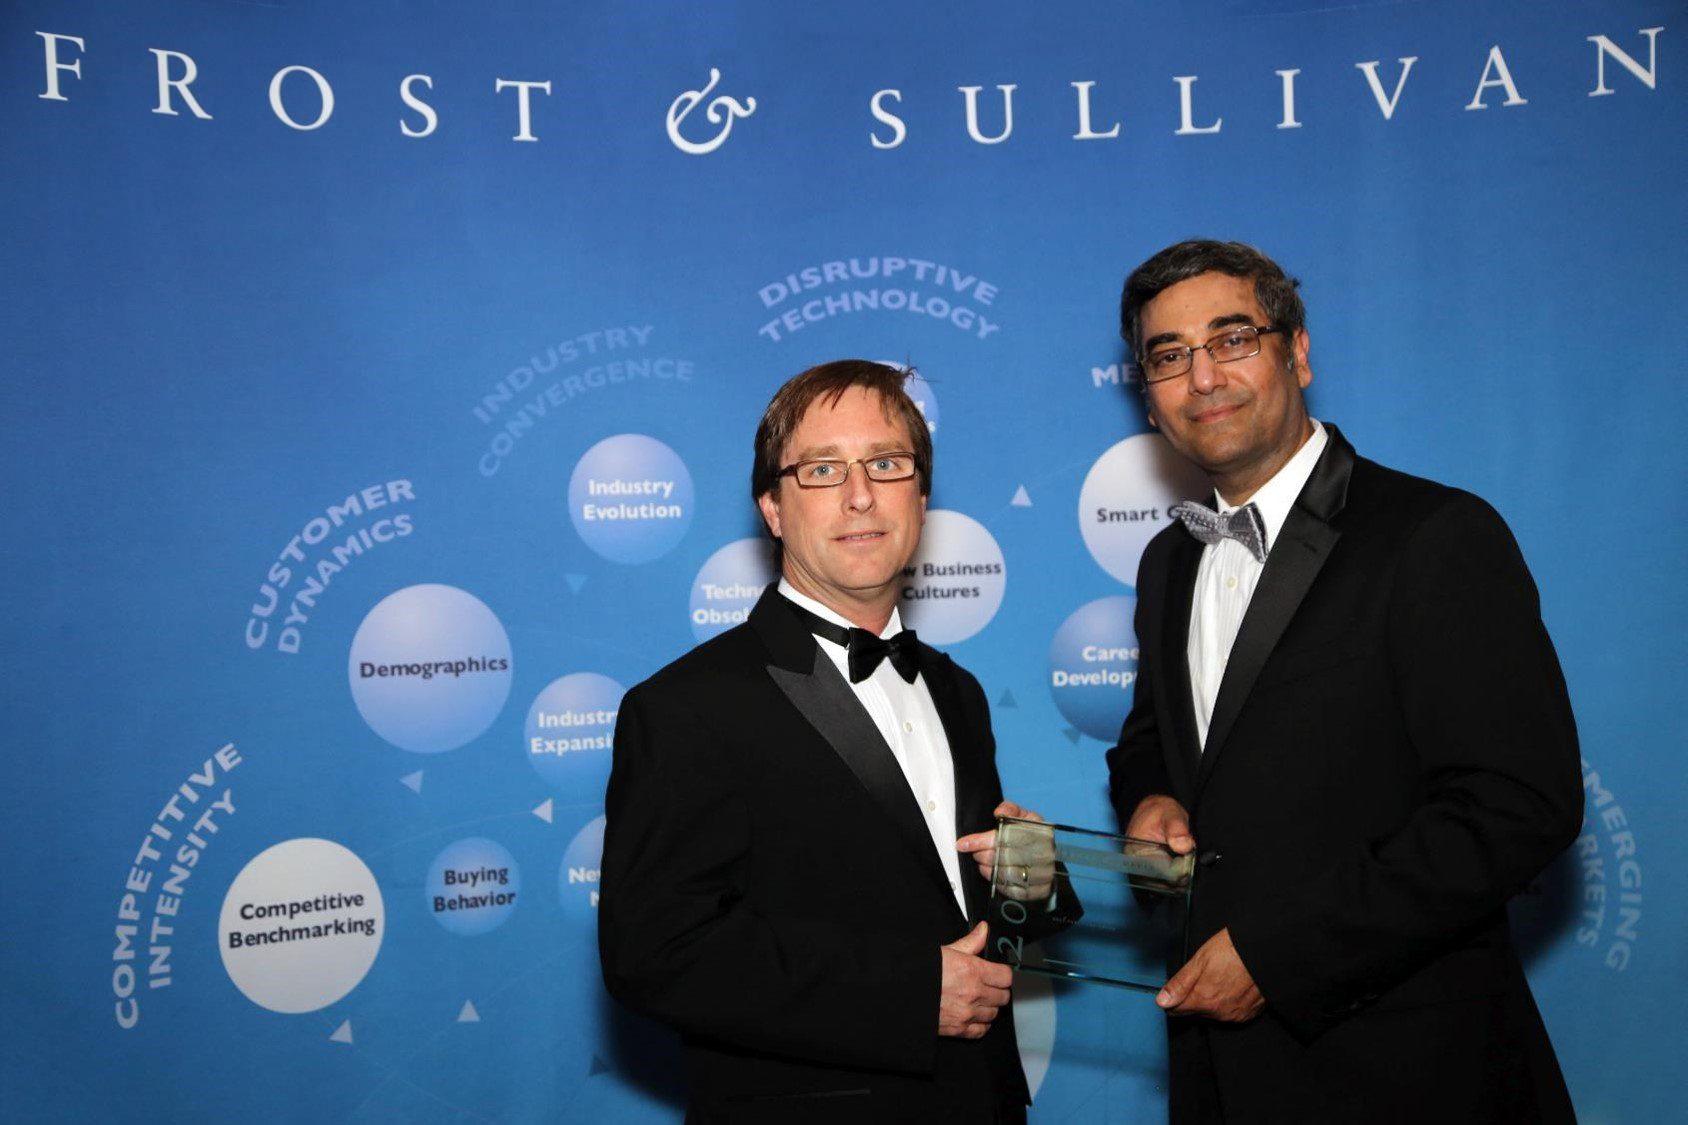 Ralph Marsh from ATS receives Frost & Sullivan Award